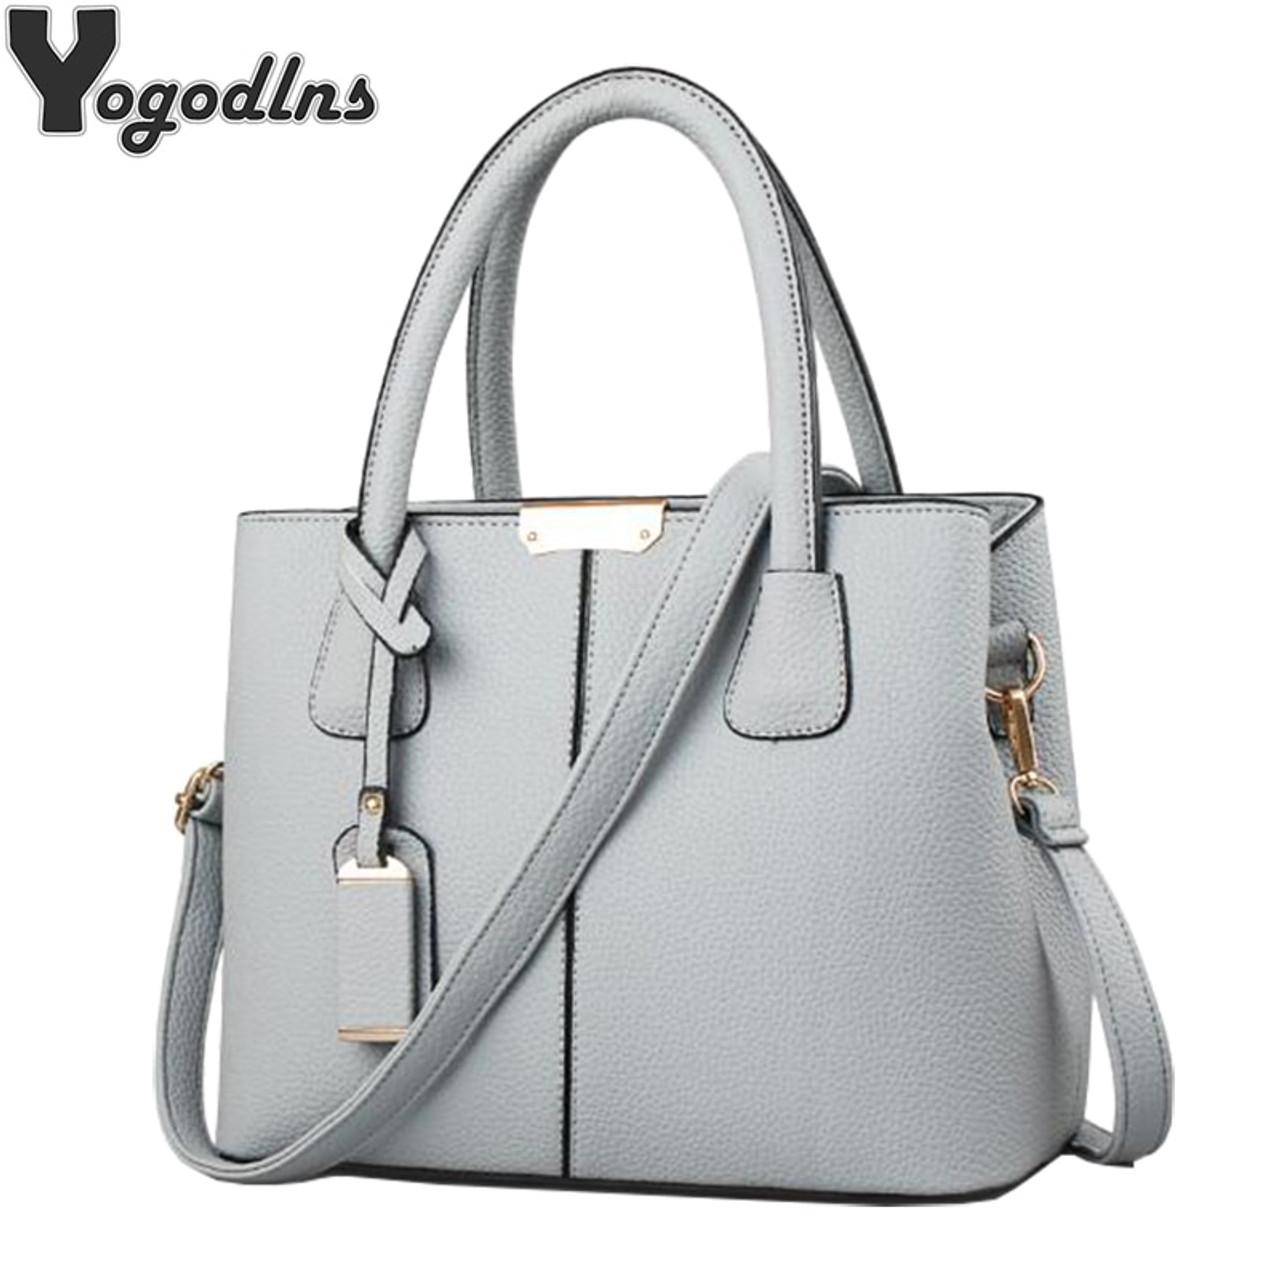 2a33077b11 Women PU Leather Handbags Ladies Large Tote Bag Female Square Shoulder Bags  Bolsas Femininas Sac New ...